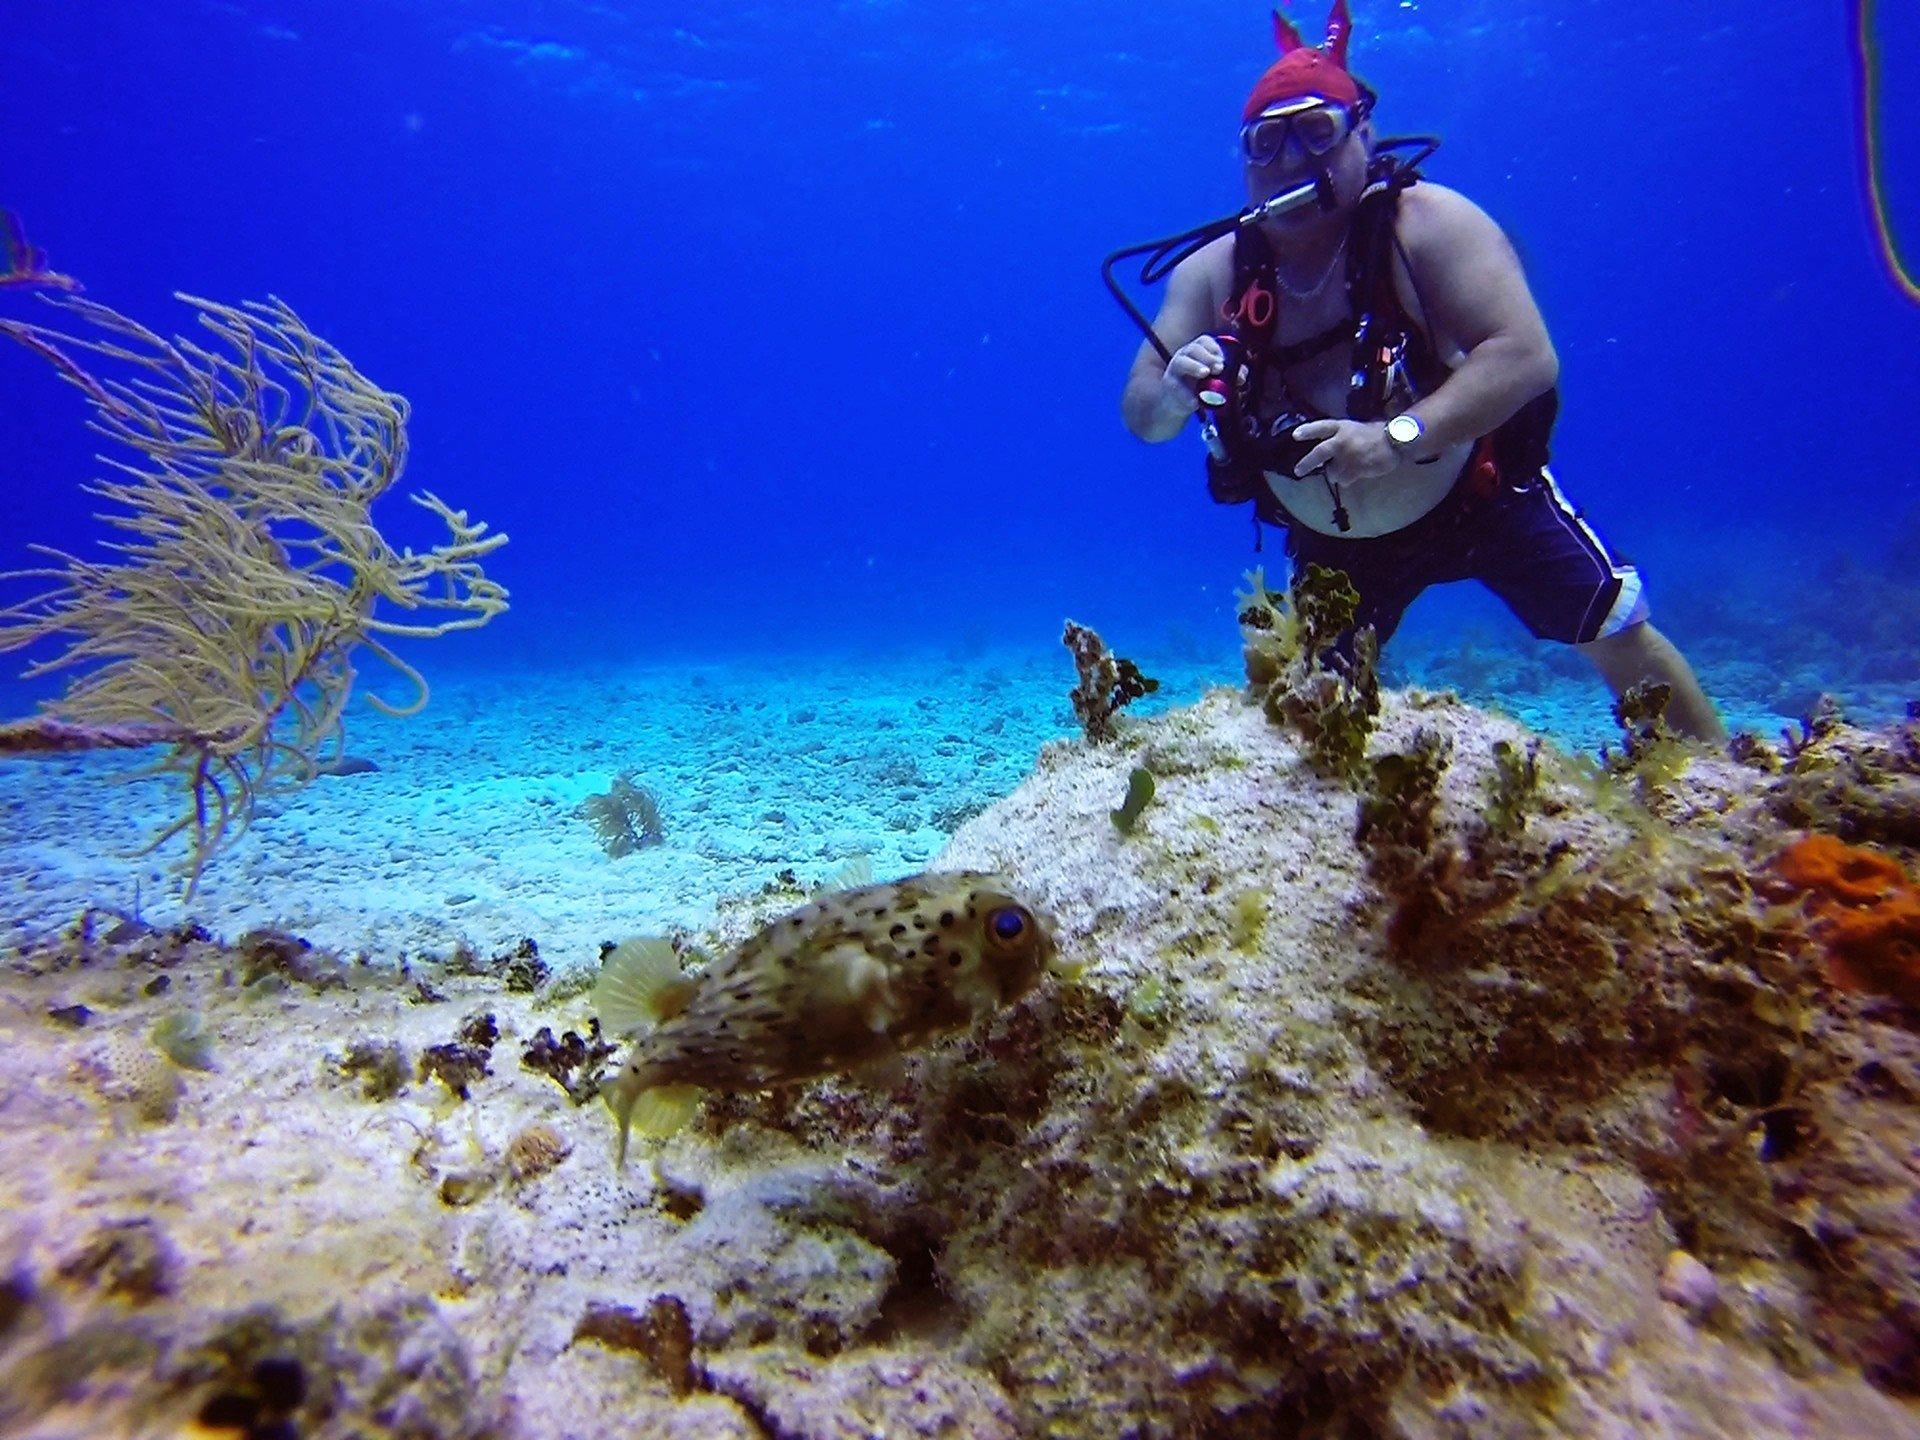 Underwater World Scuba Center image 1